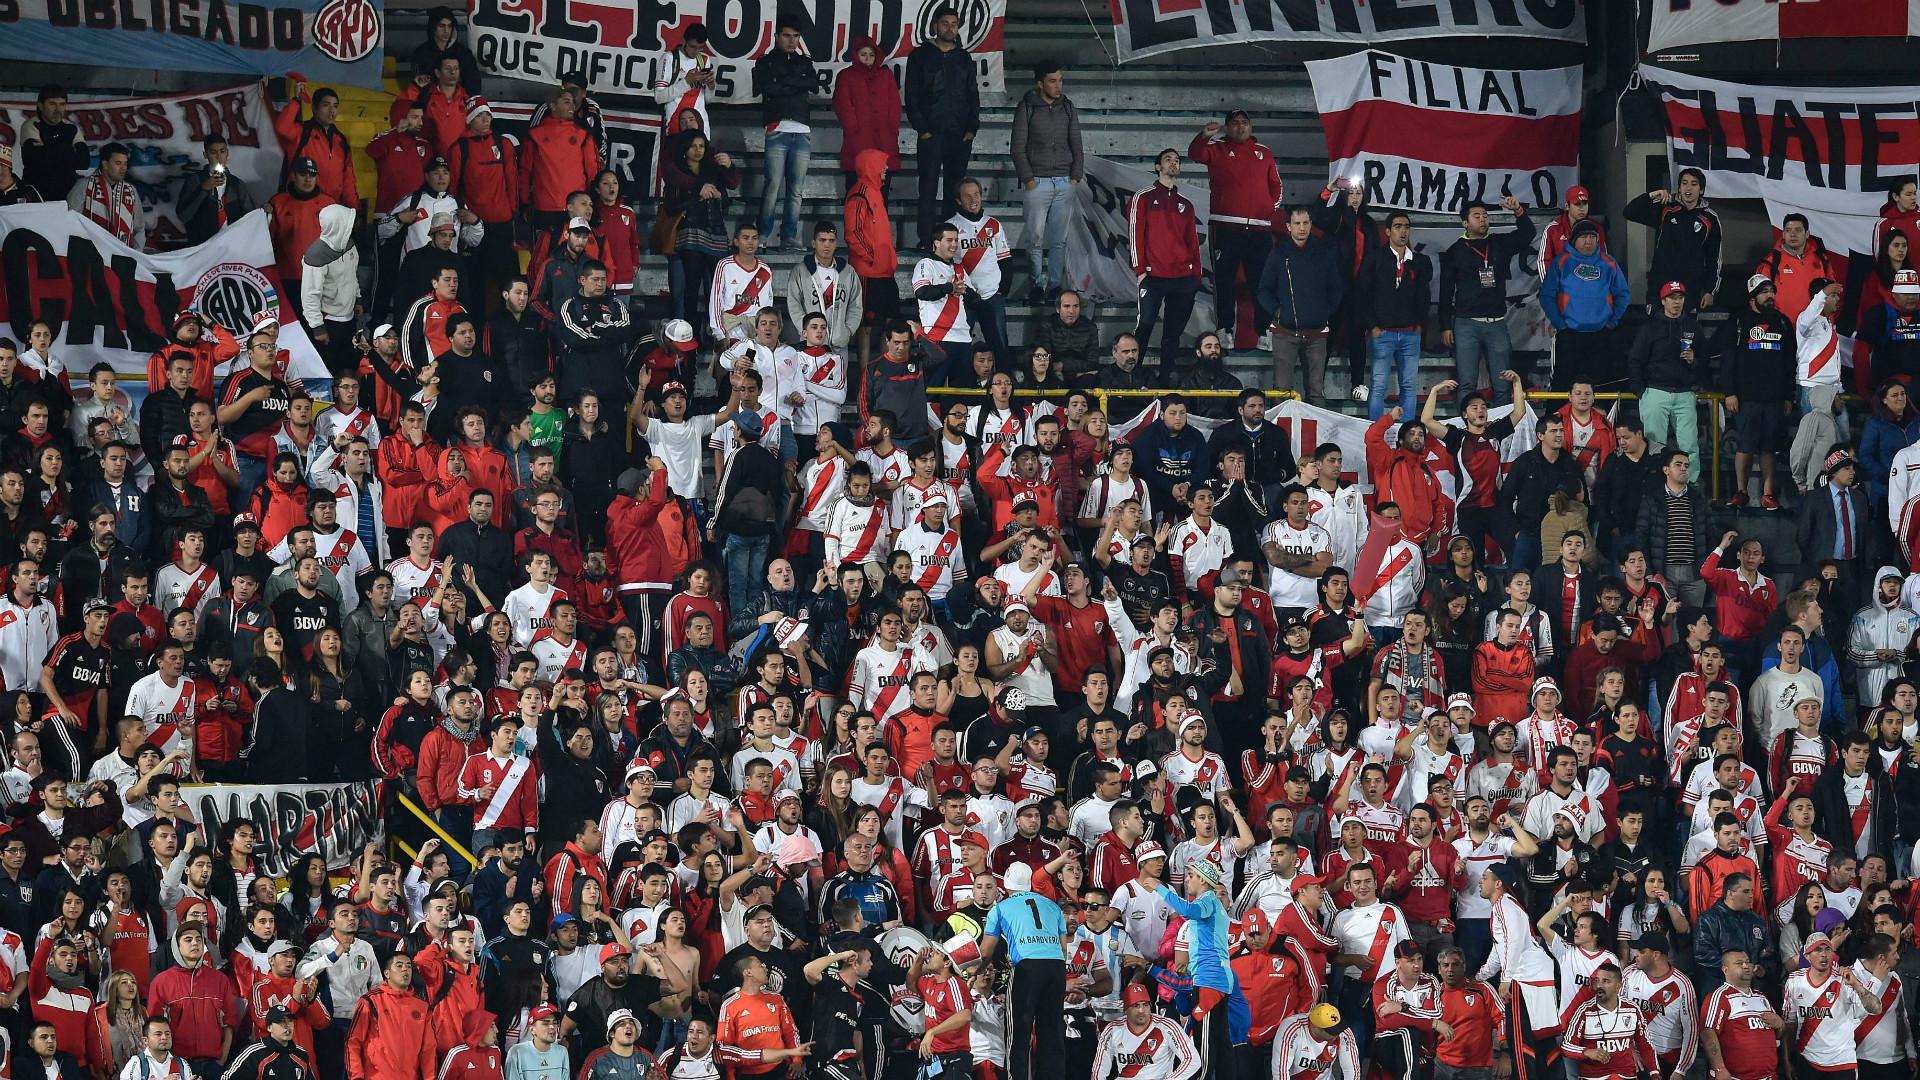 HD River Plate fans